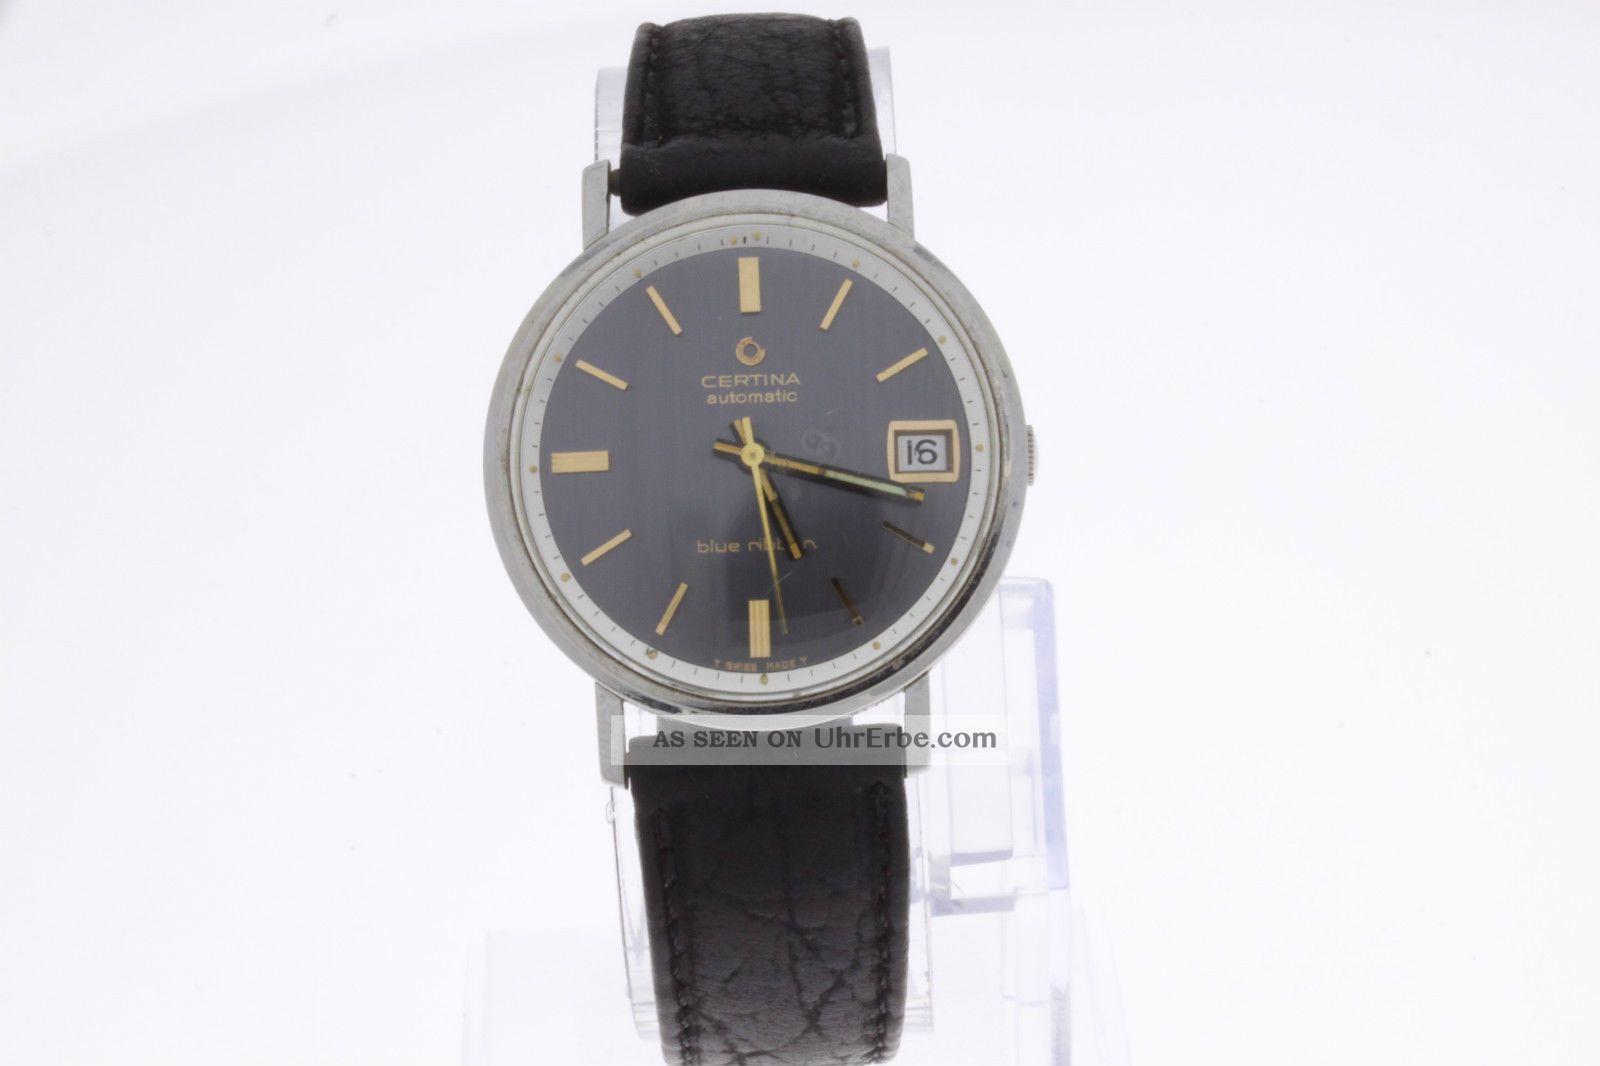 Certina Blue Ribbon Automatic Armbanduhr Armbanduhren Bild